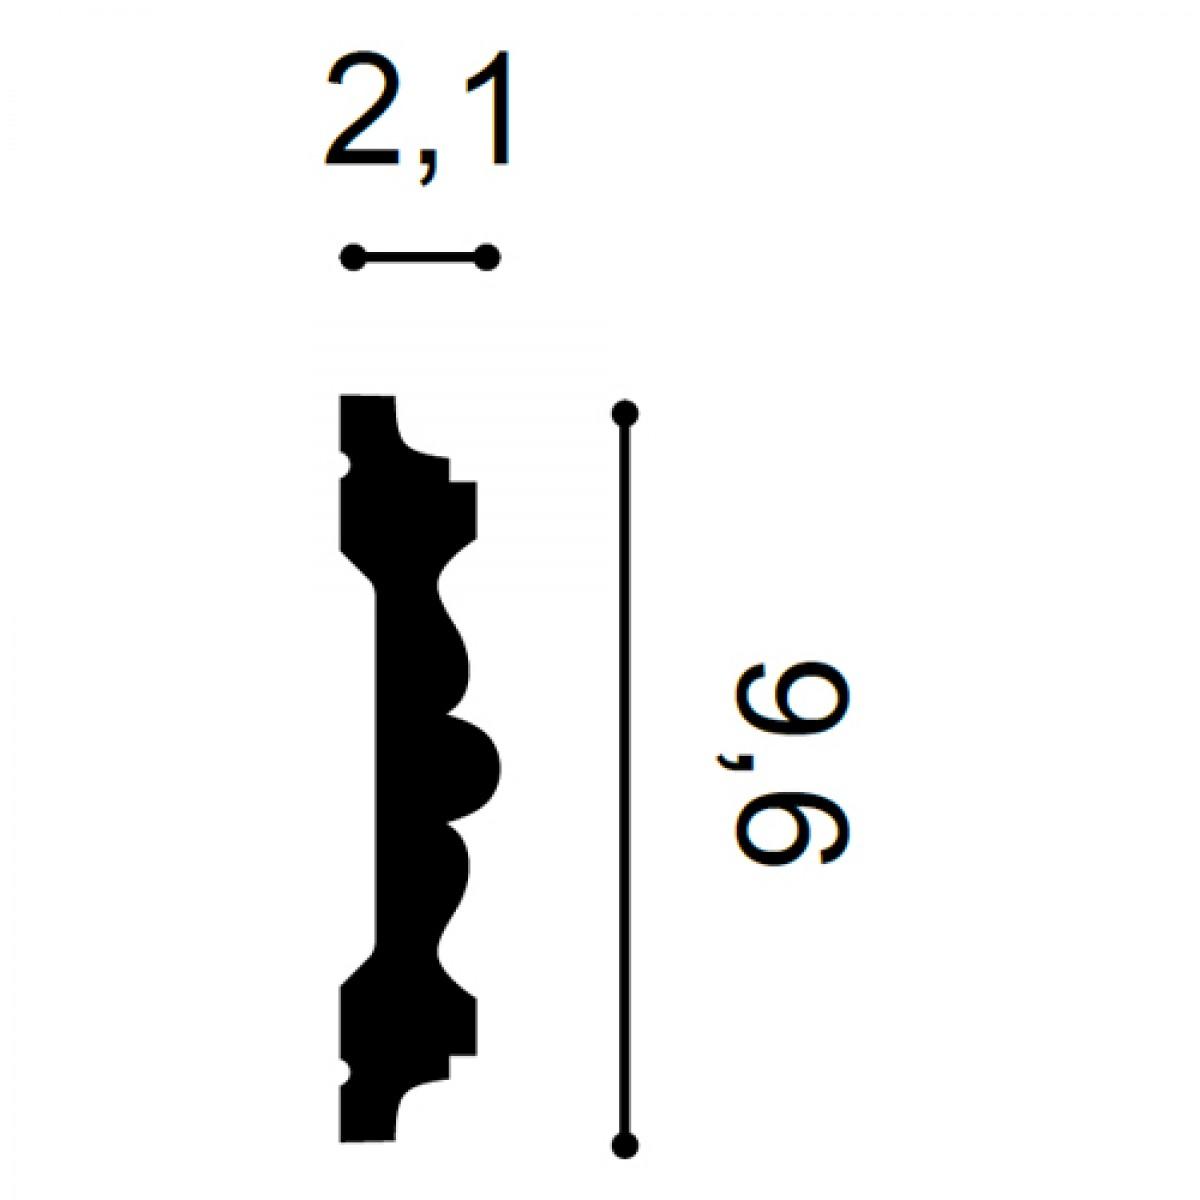 Brau Luxxus P9020, Dimensiuni: 200 X 9.6 X 2.1 cm, Orac Decor